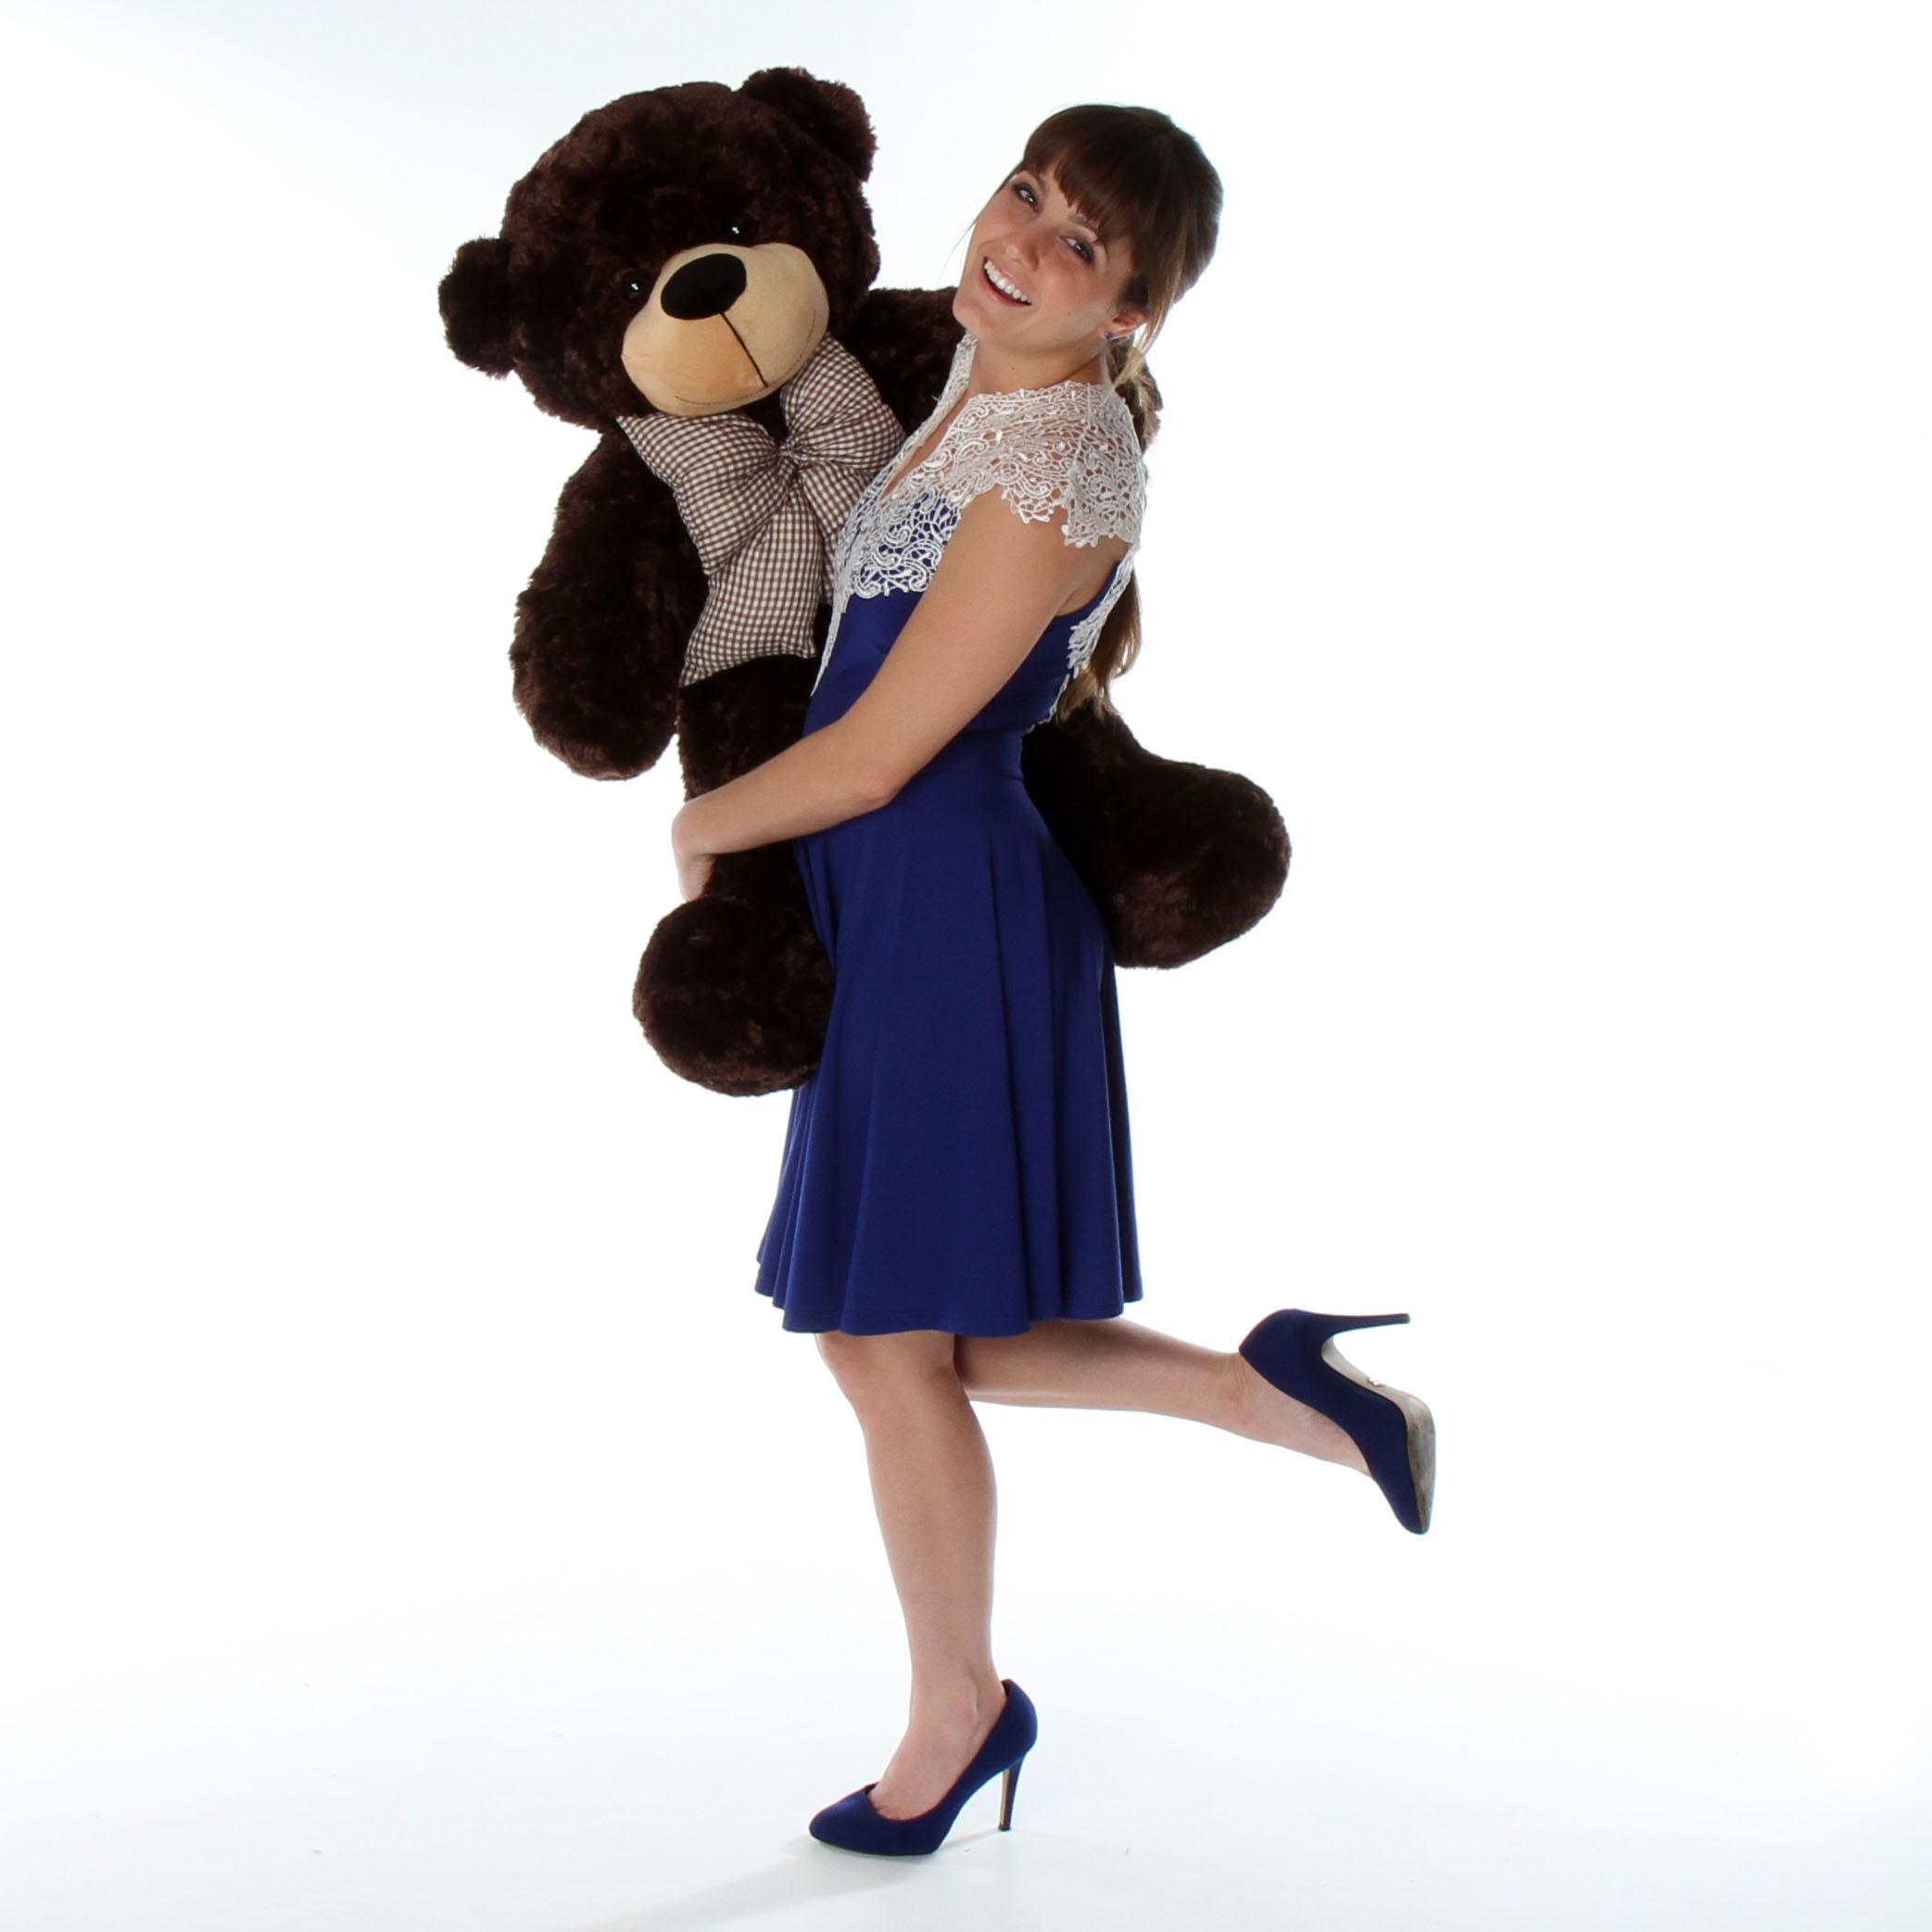 tall-dark-handsome-and-cuddly-38in-life-size-giant-teddy-bear-brownie-cuddles-dk-brown-fur.jpg